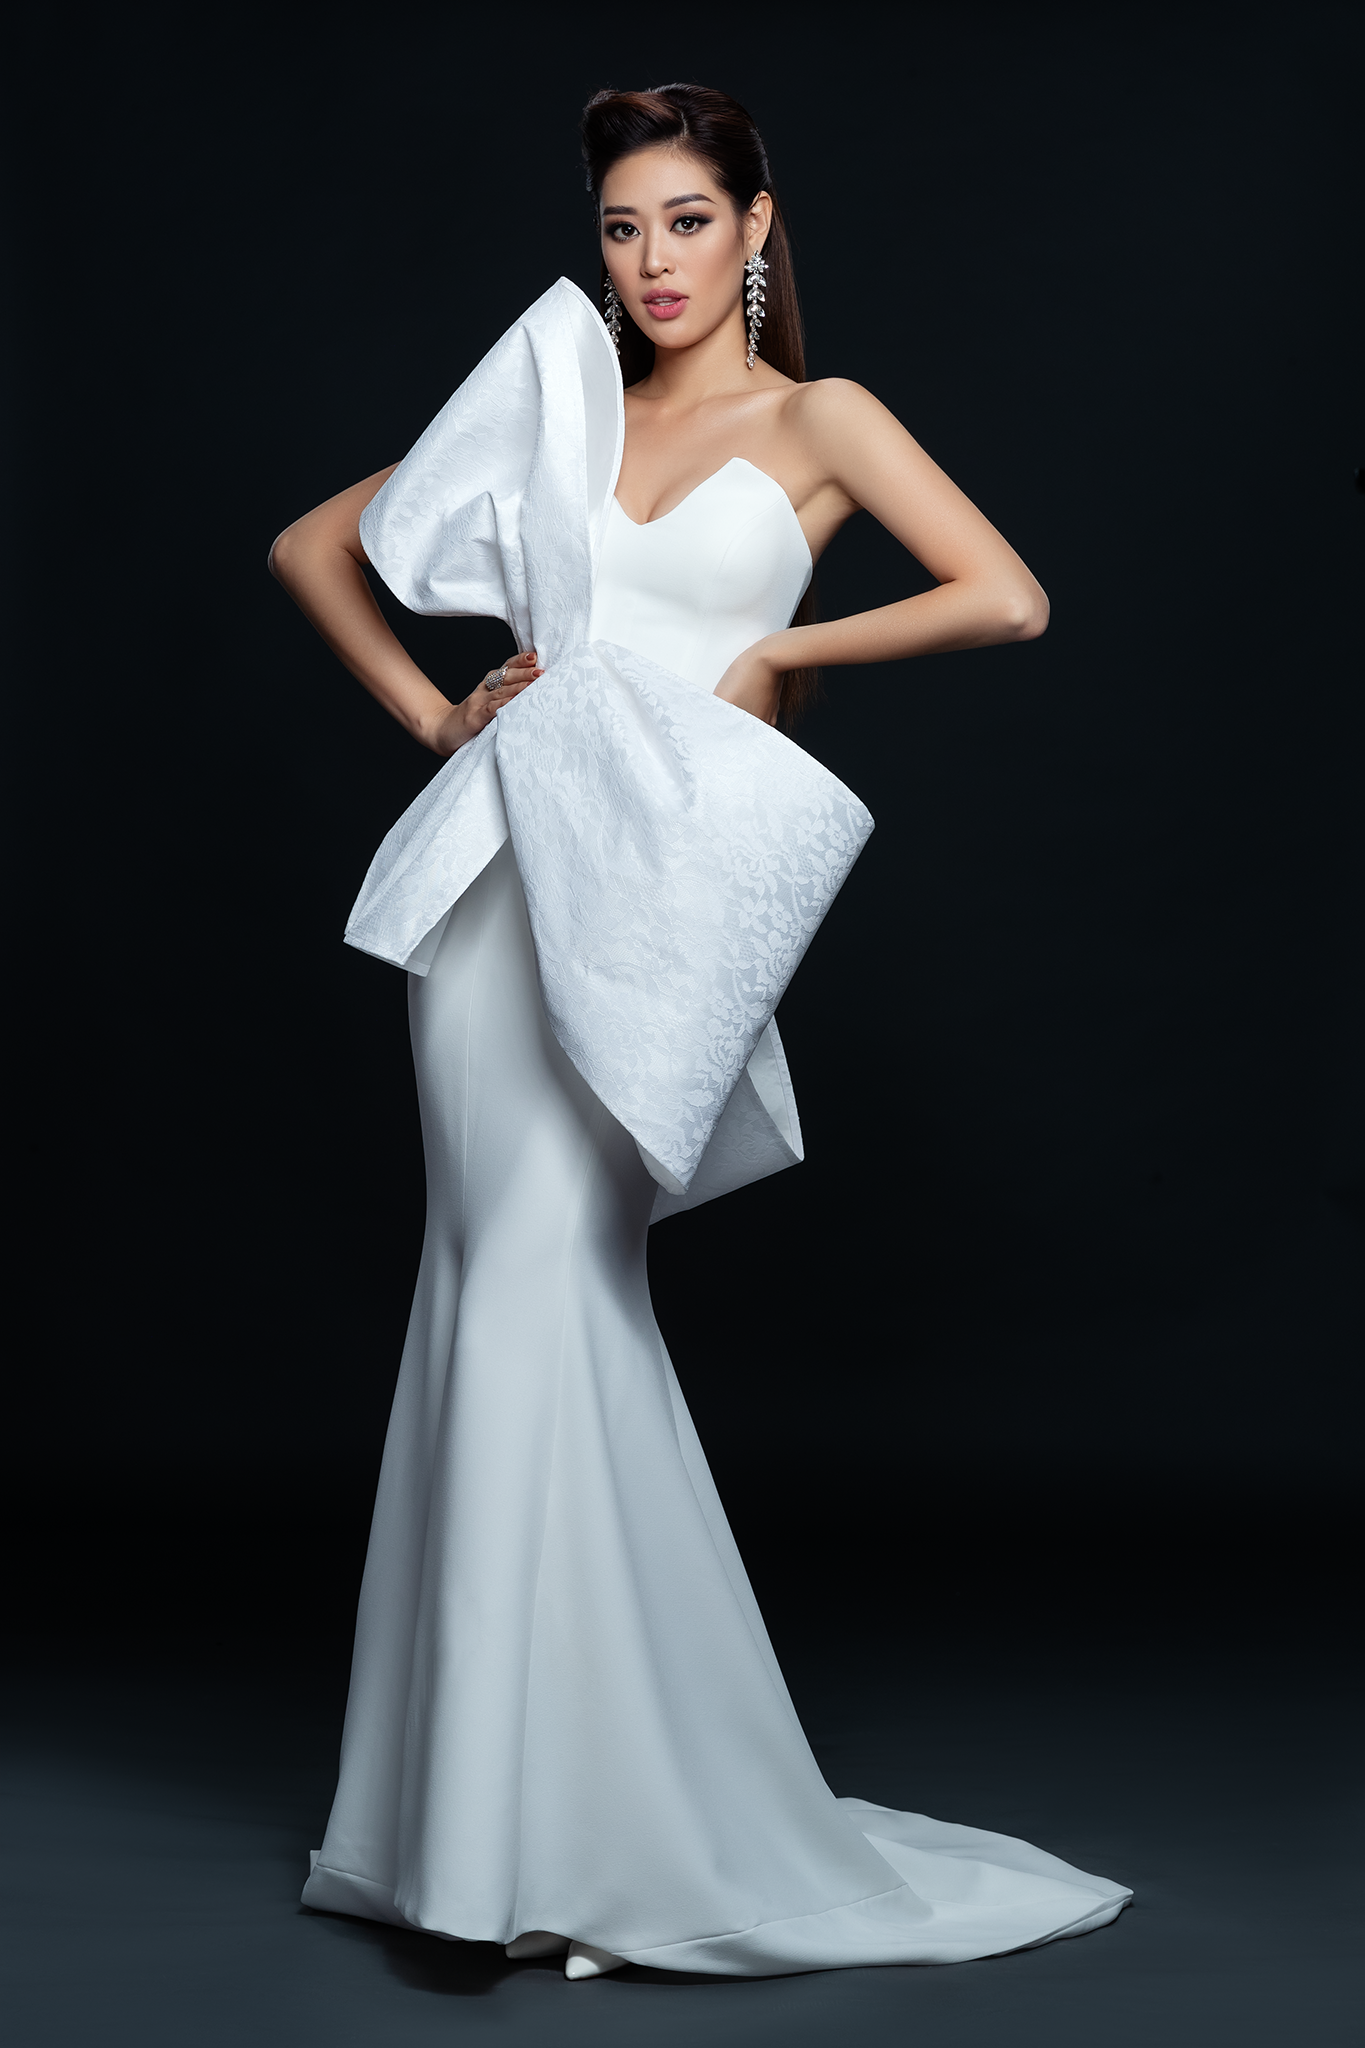 Hoa hau Khanh Van_Dress by Minh Tu (2)